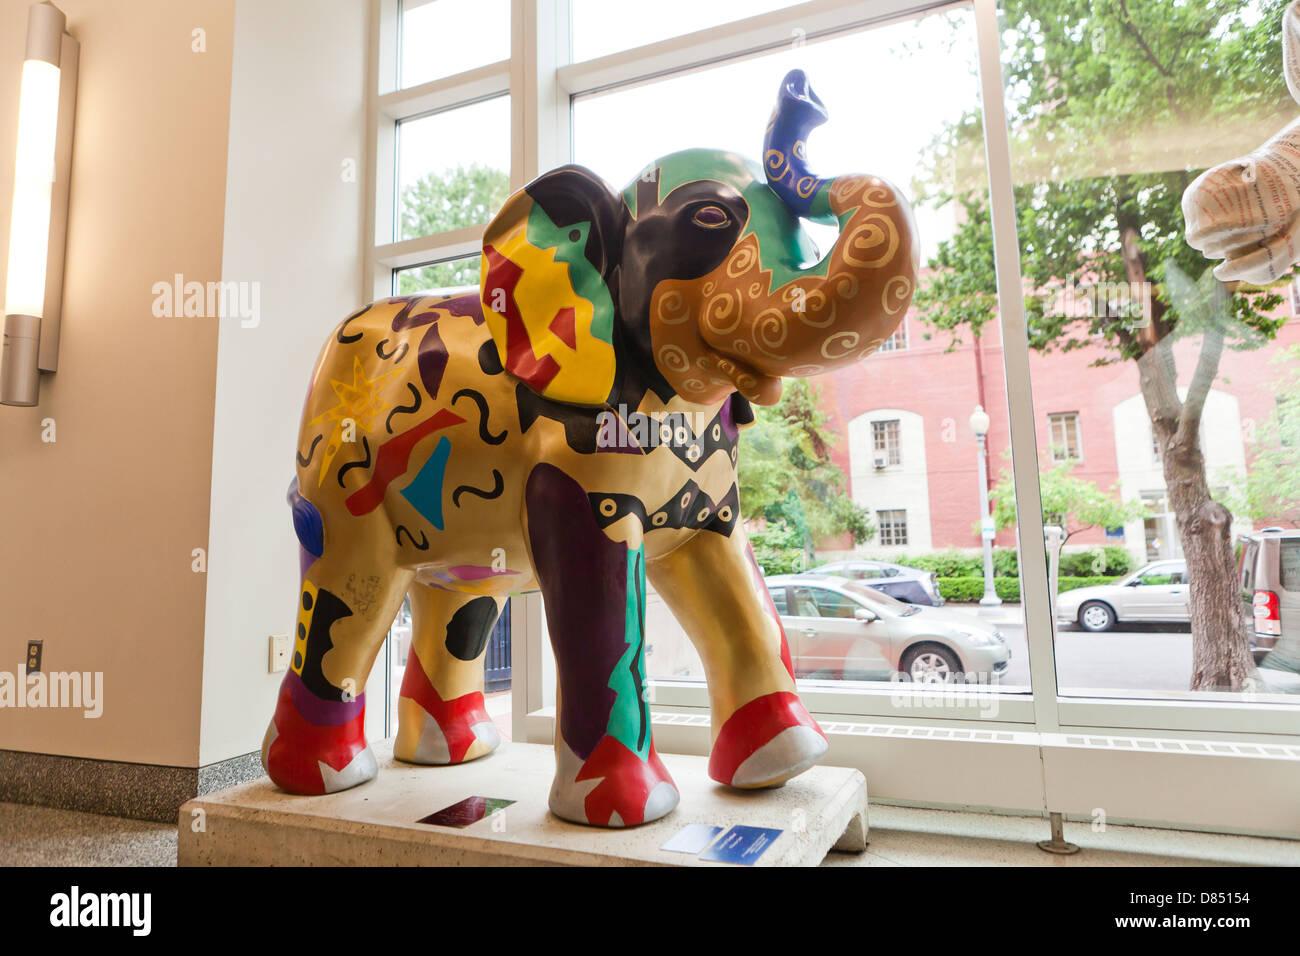 Republican Elephant sculpture - Stock Image